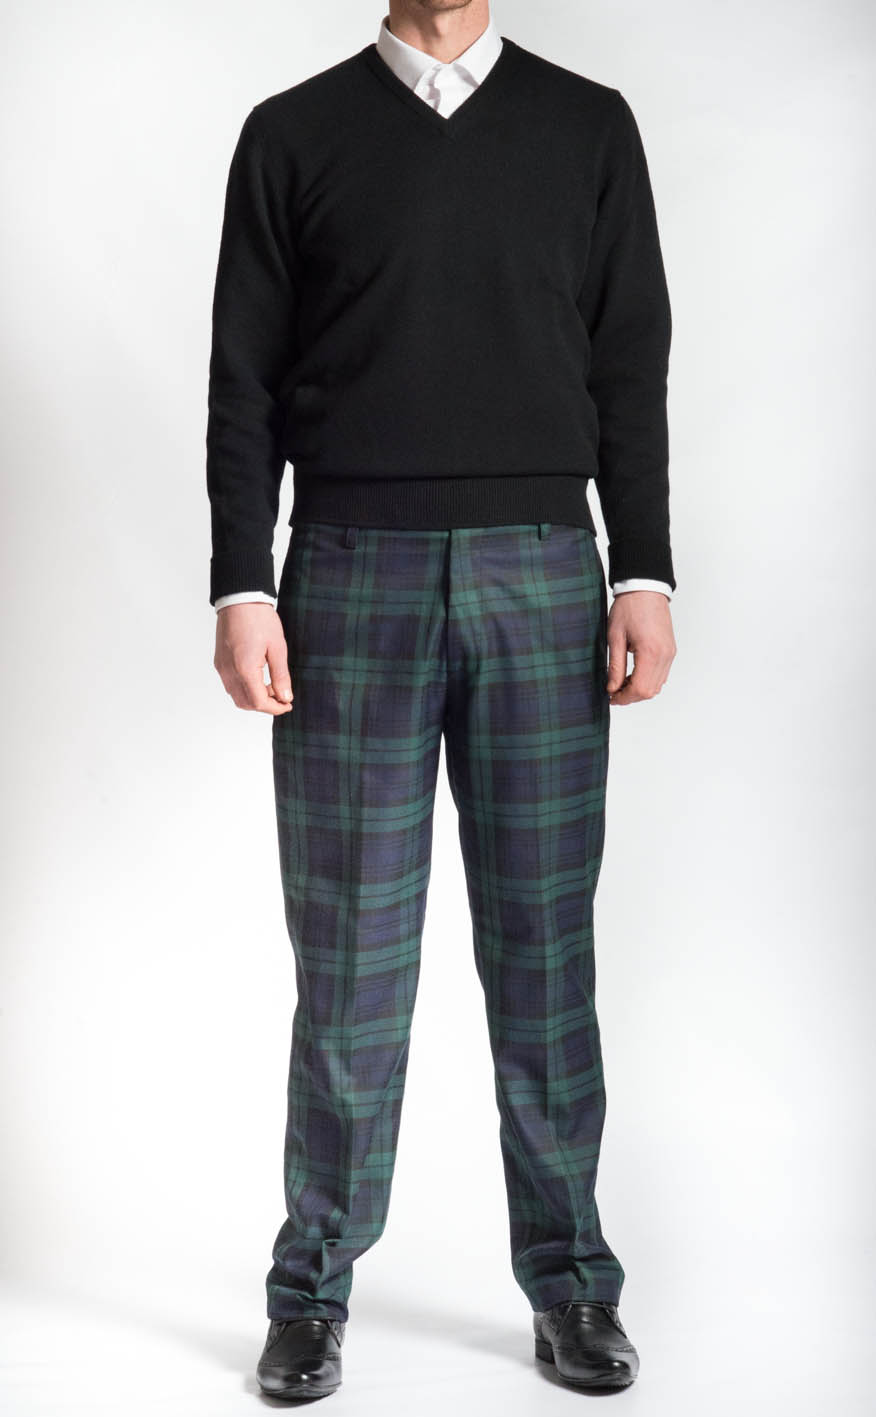 efcbd0679 Find trews tartan trousers strathisla. Shop every store on the ...